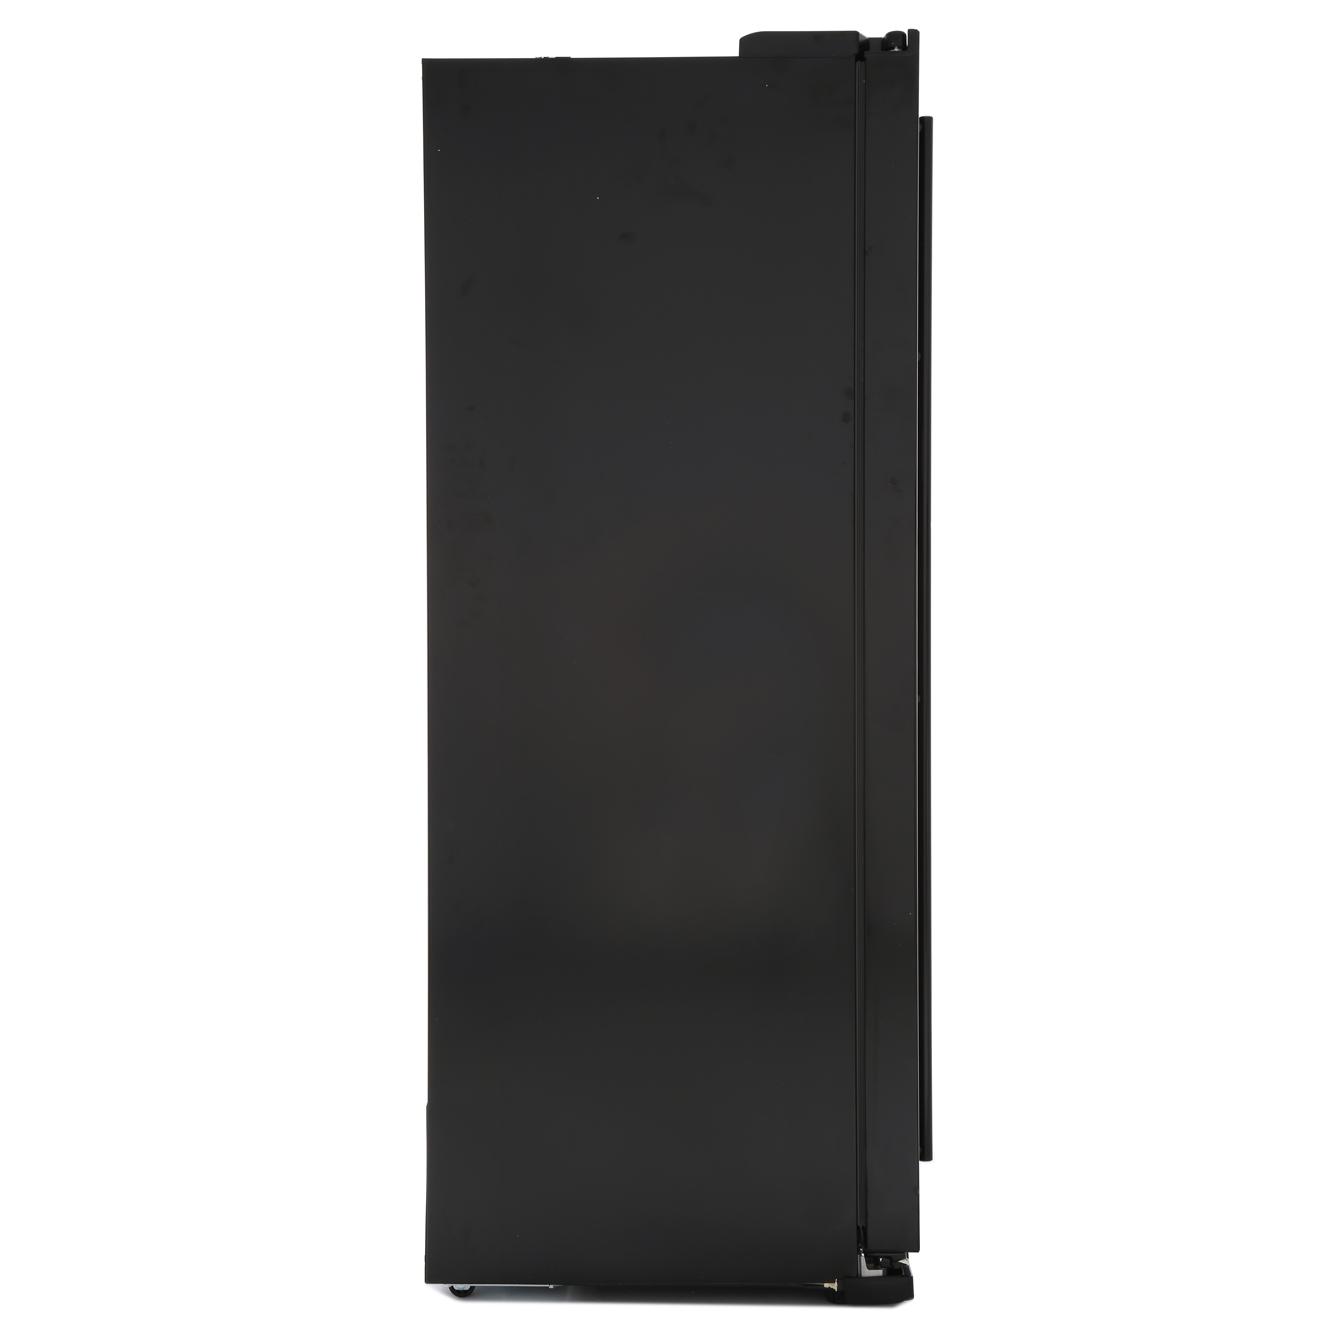 Buy Samsung Rs7527bhcbc American Fridge Freezer Empire